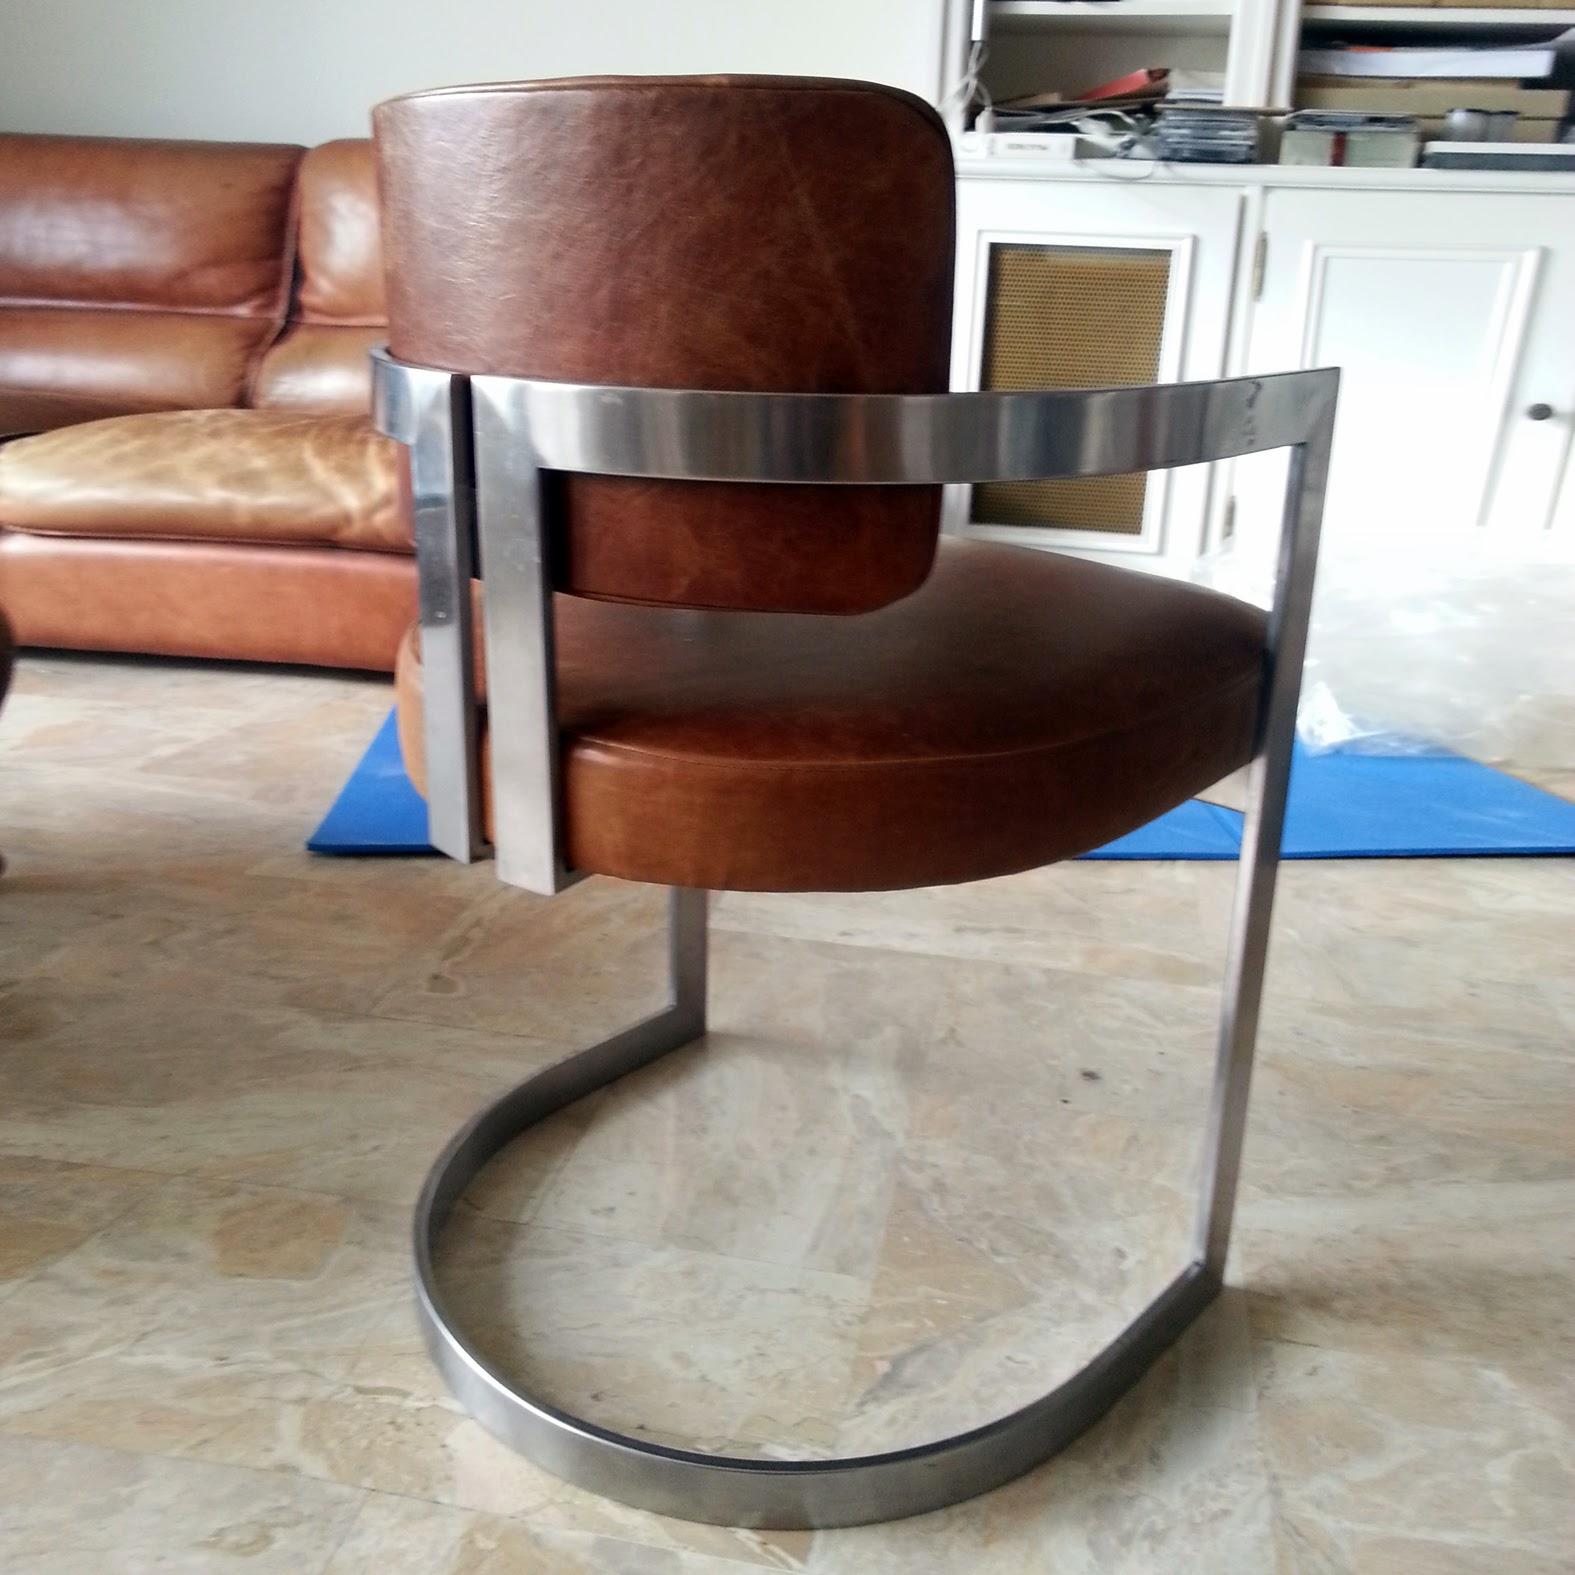 fauteuil d ordinateur ikea. Black Bedroom Furniture Sets. Home Design Ideas